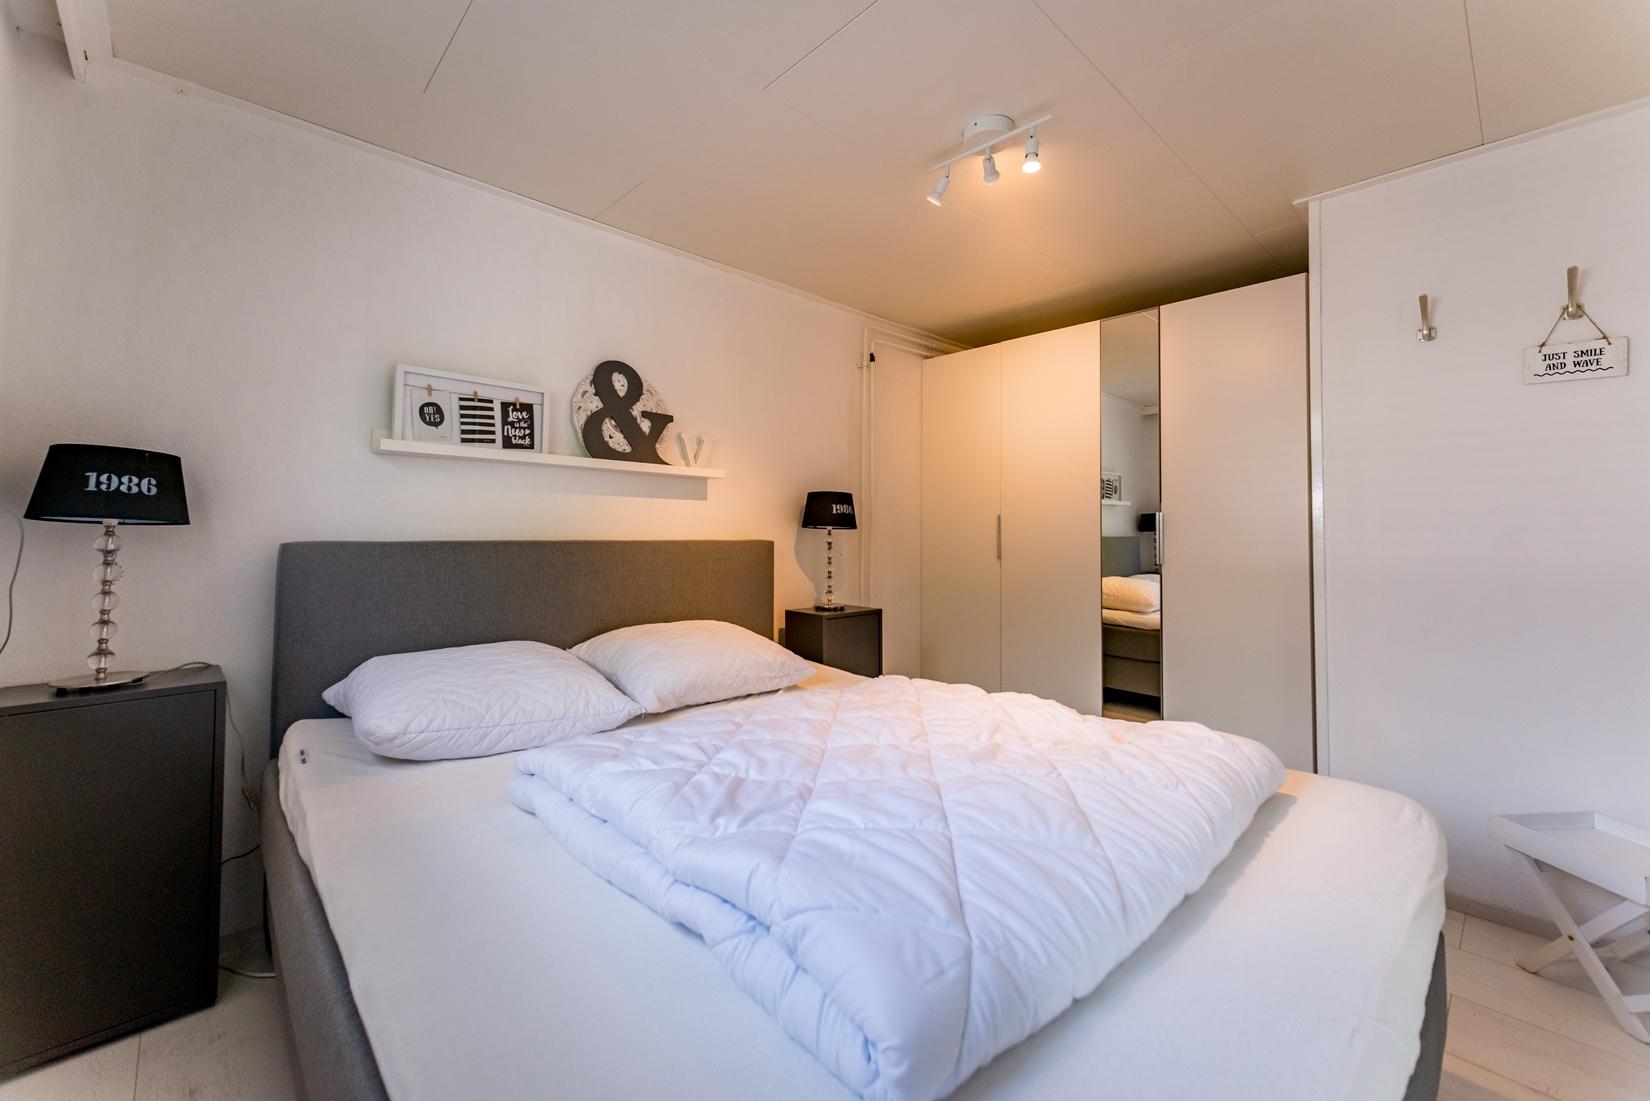 chalet-gestrand-interieur-master-bedroom-spiegelkast